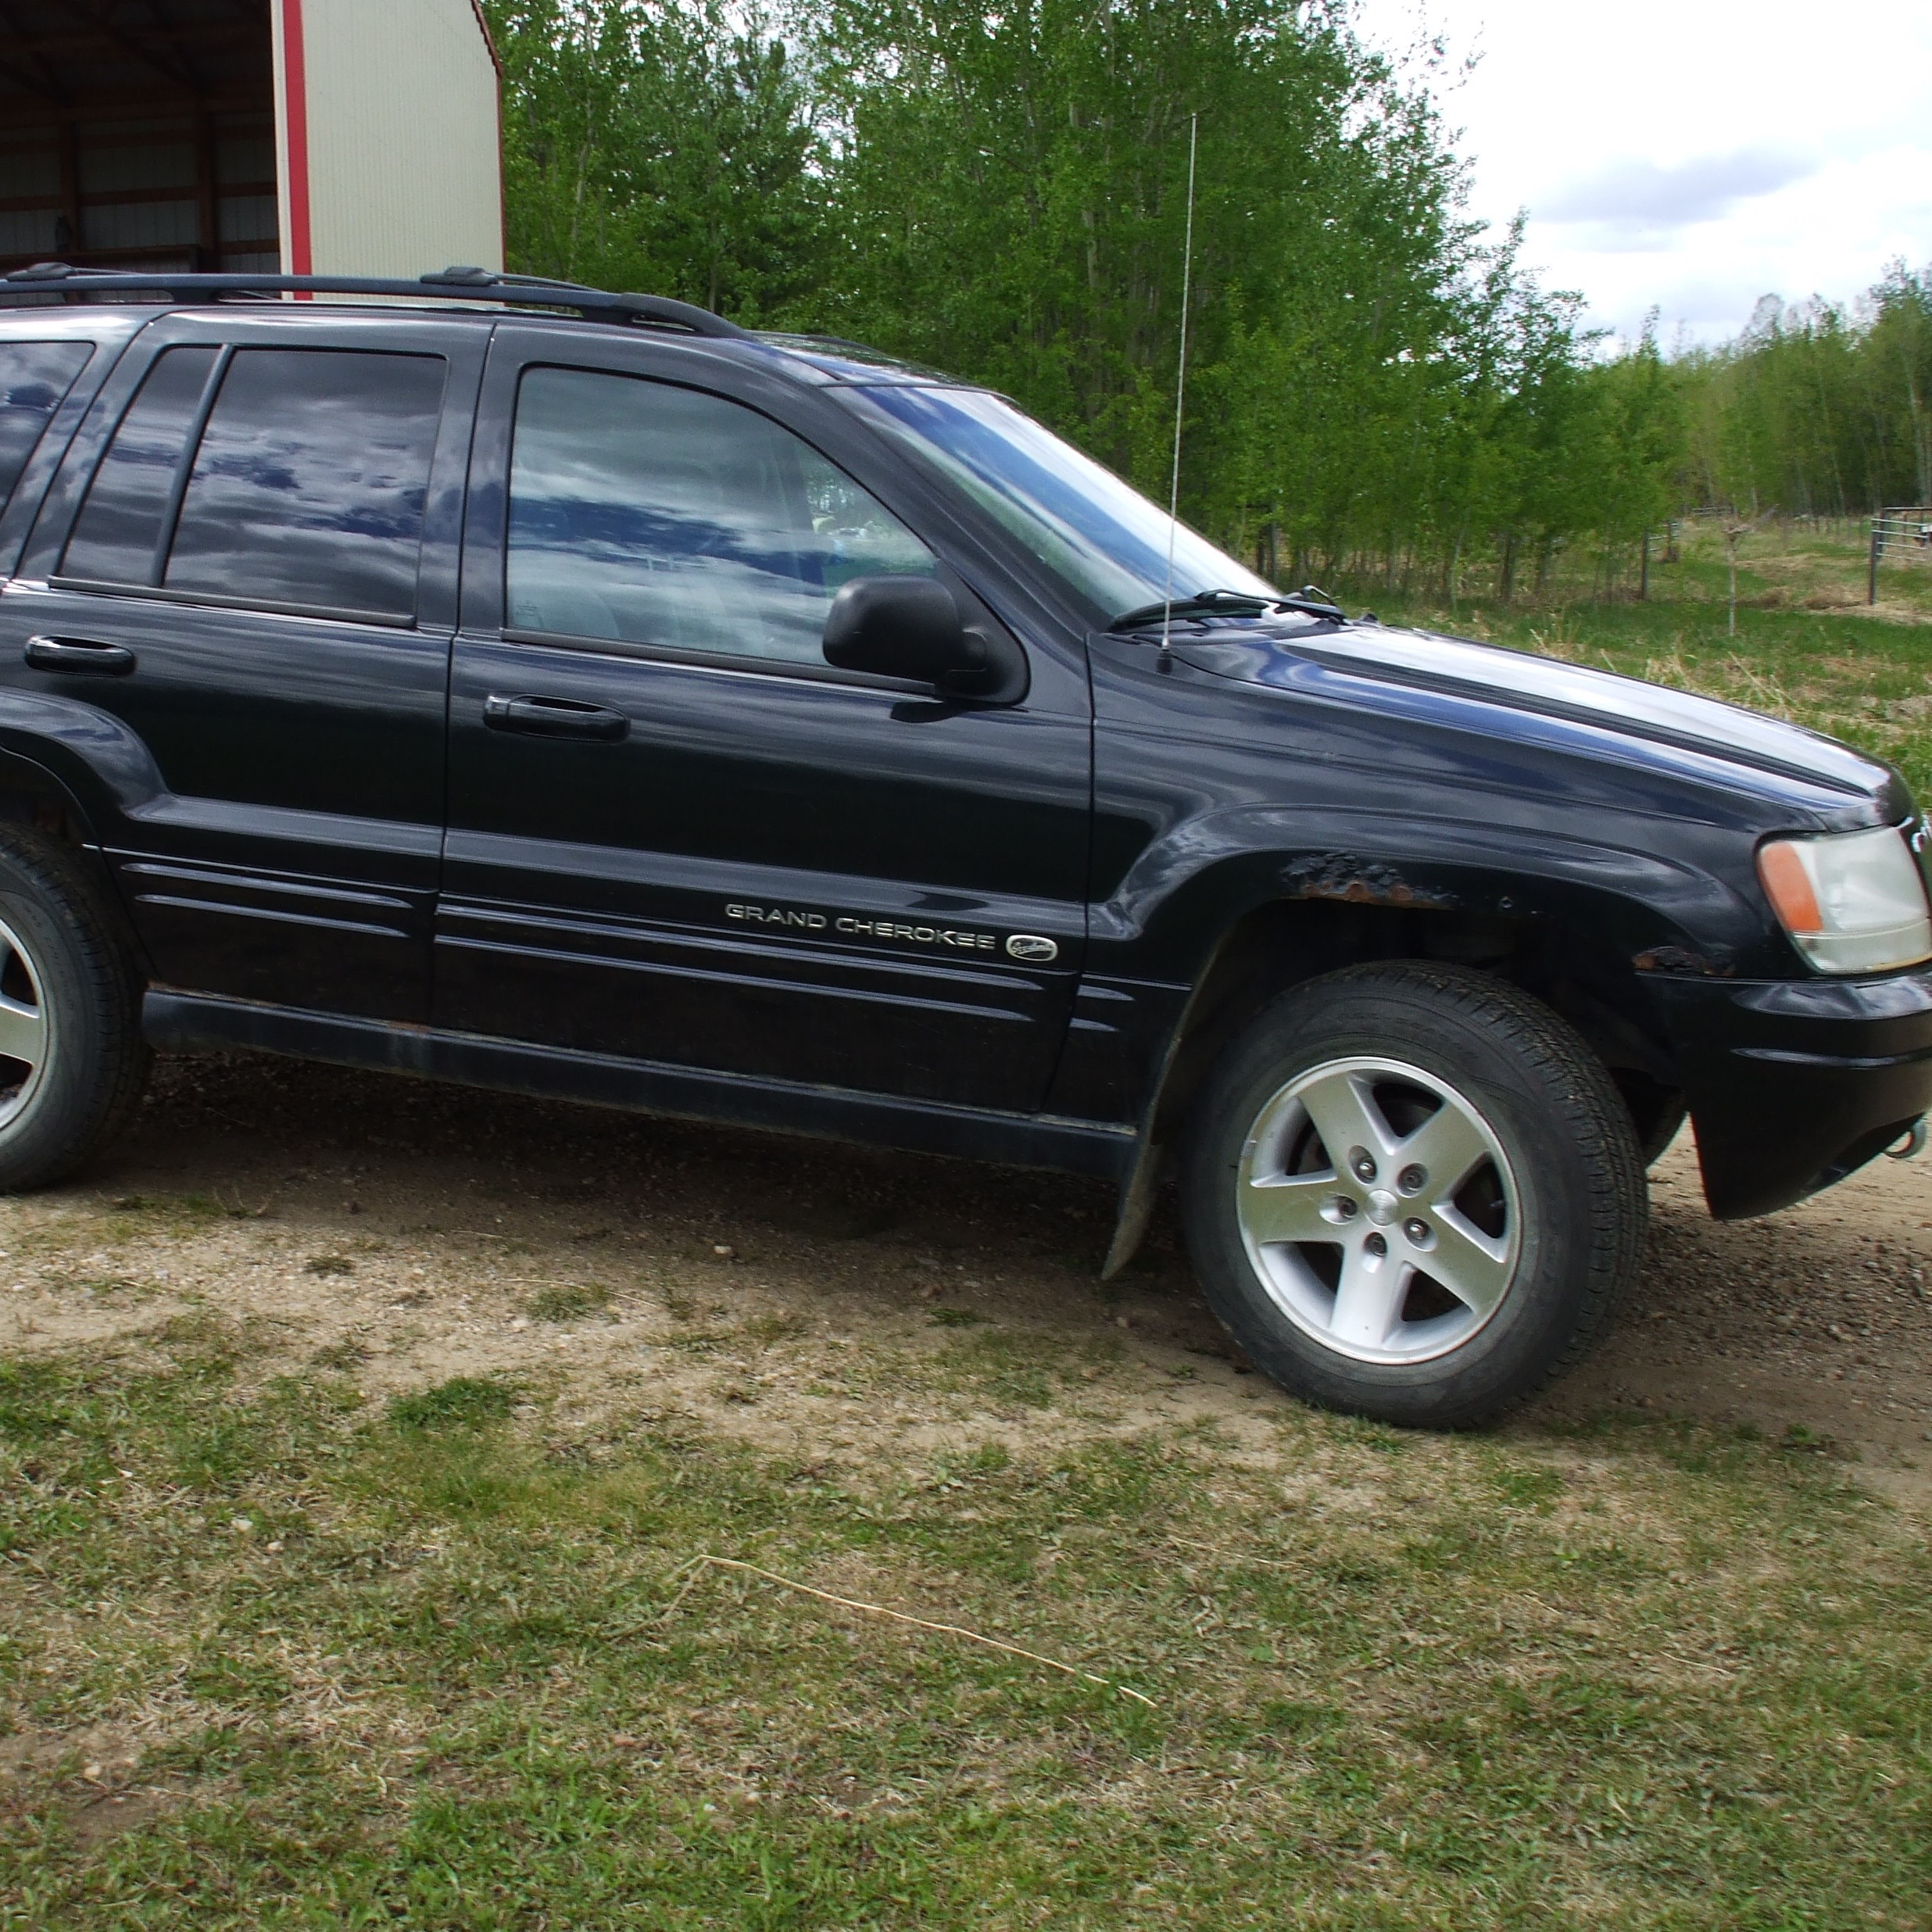 2002 Jeep, SUV ,black, 224,000 km sn: 1J8GW68J73C528479 - Image 6 of 6